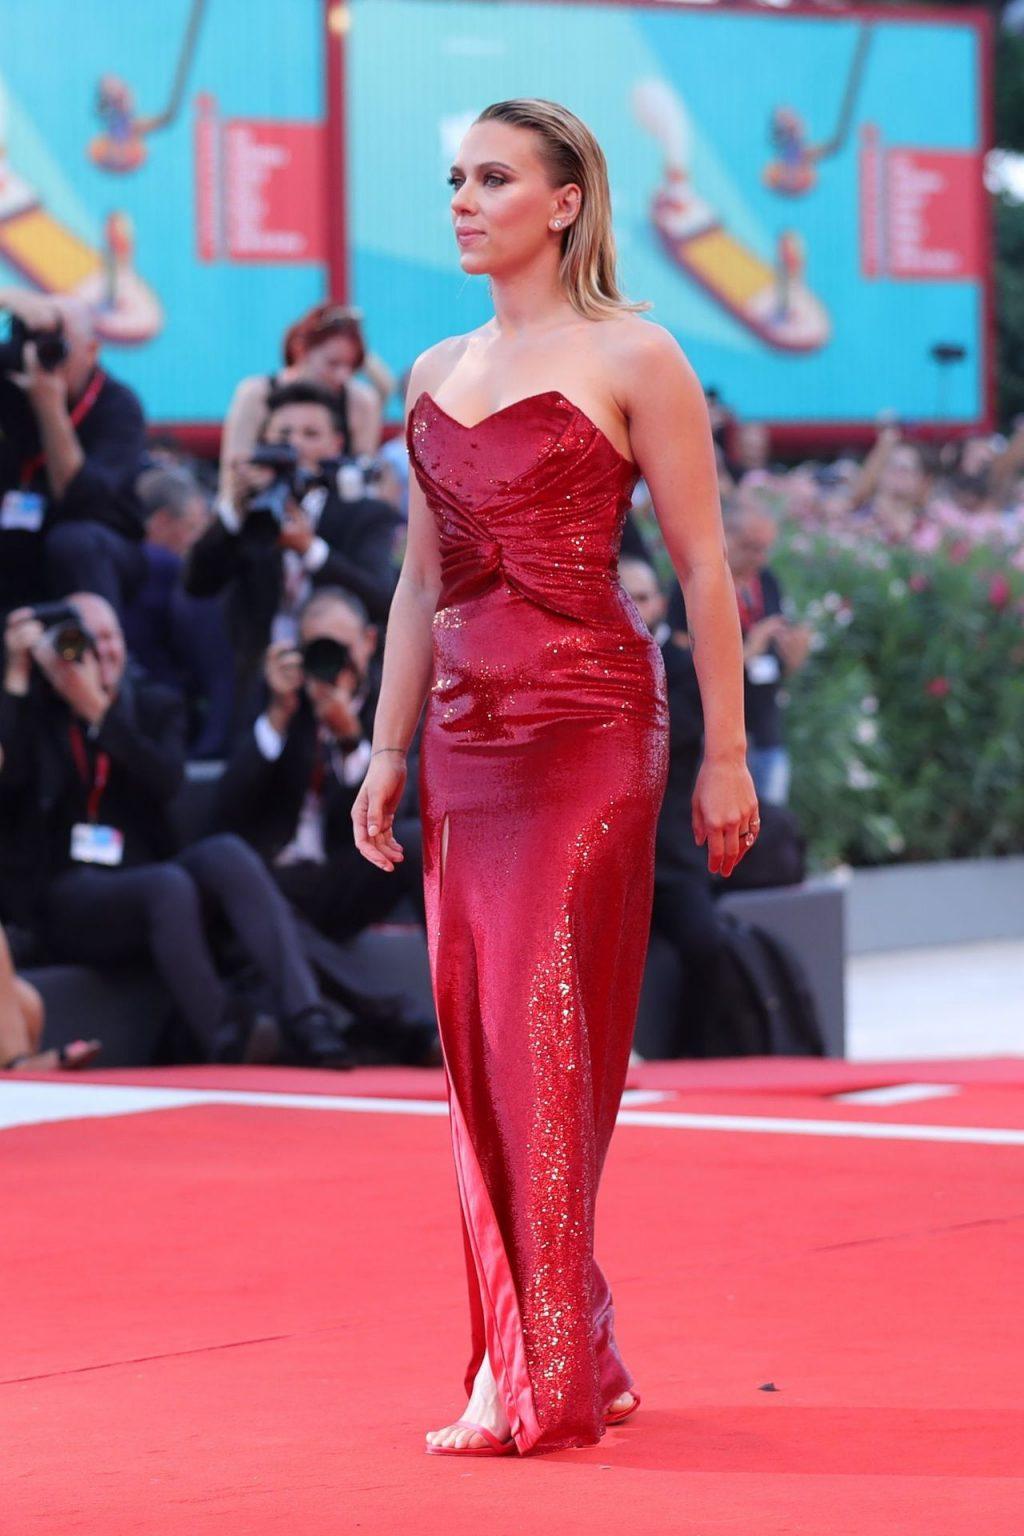 Scarlett Johansson Erotic